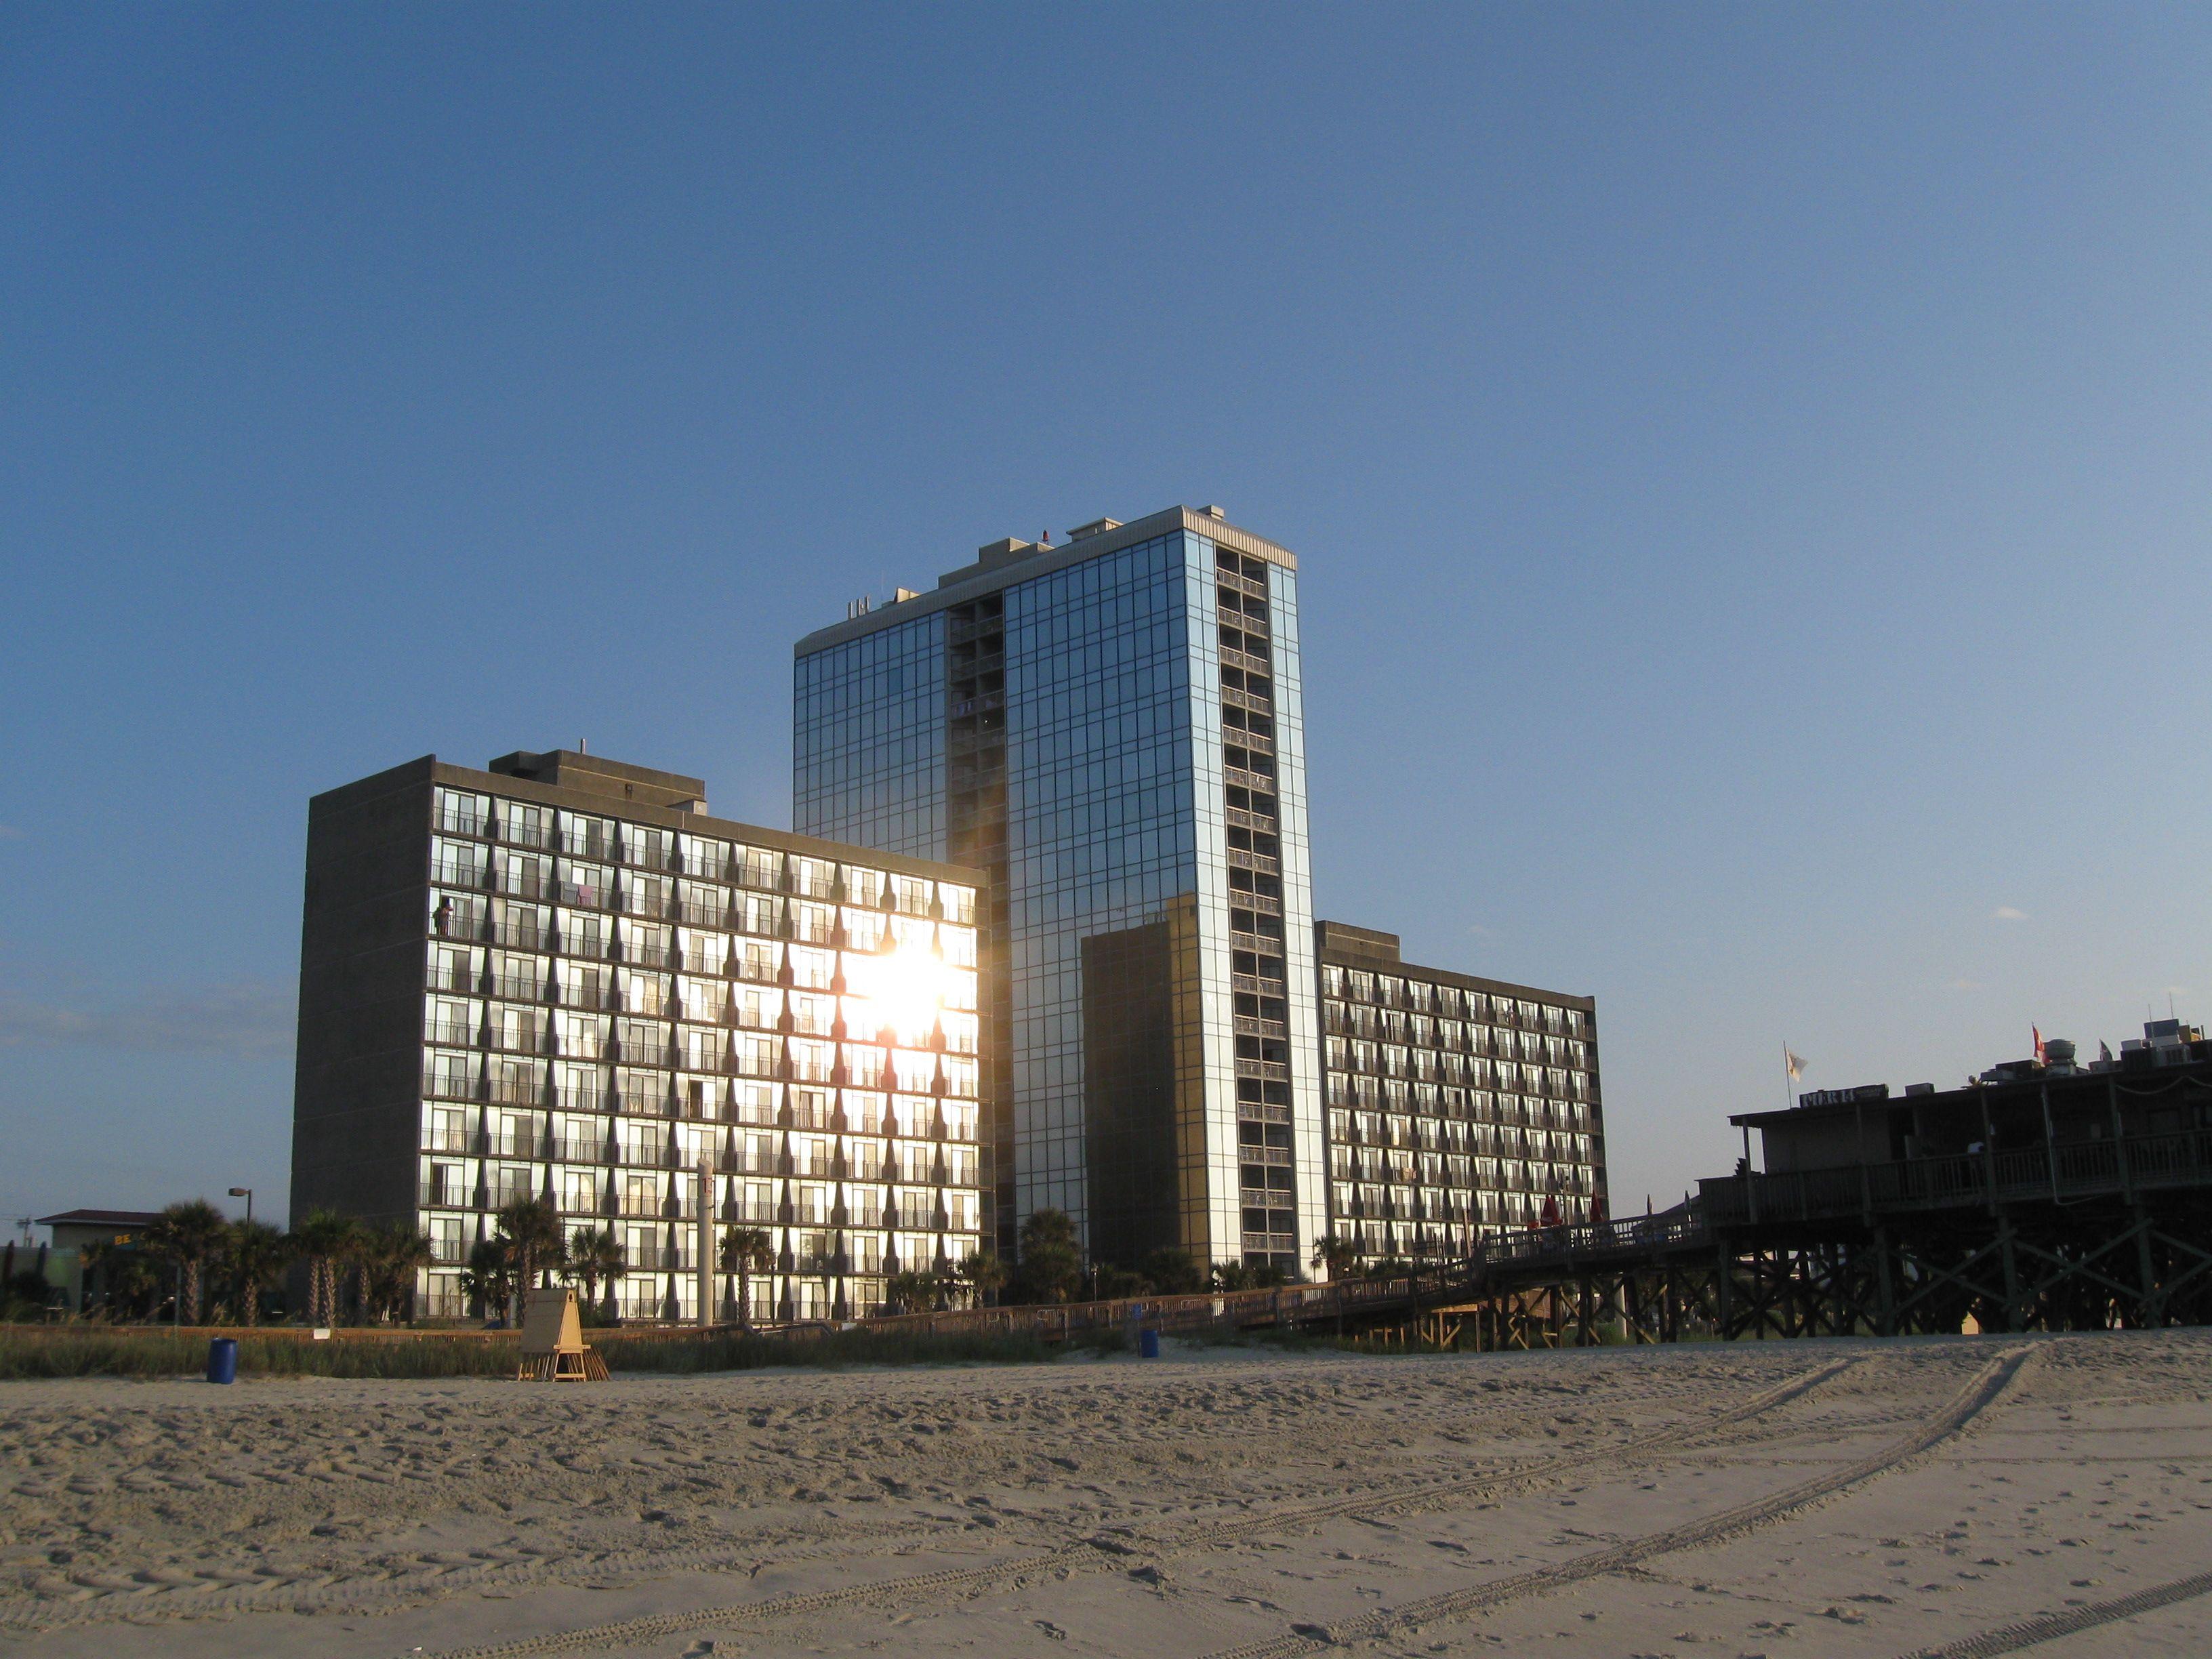 Hotels In Myrtle Beach Sc >> Oceanfront Hotels Myrtle Beach Sc Myrtlebeach